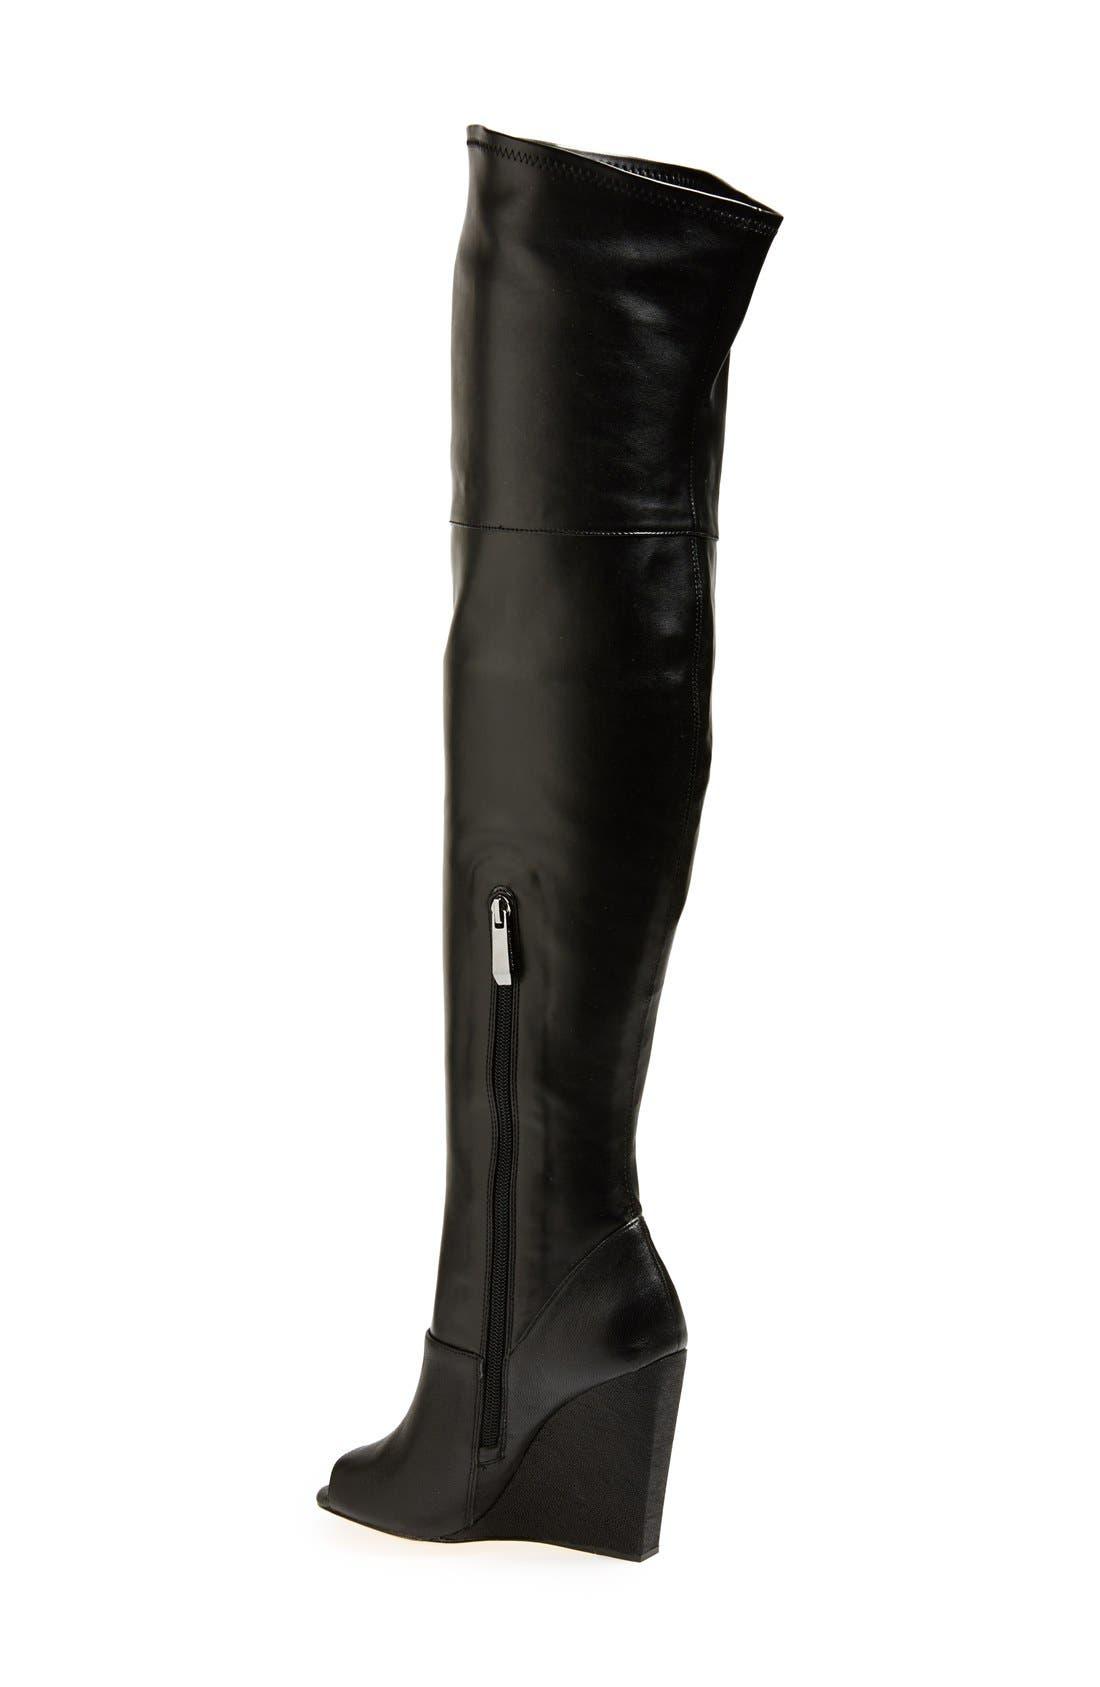 BCBGMAXAZRIA,                             'Deanna' Over the Knee Leather Peep Toe Boot,                             Alternate thumbnail 4, color,                             001